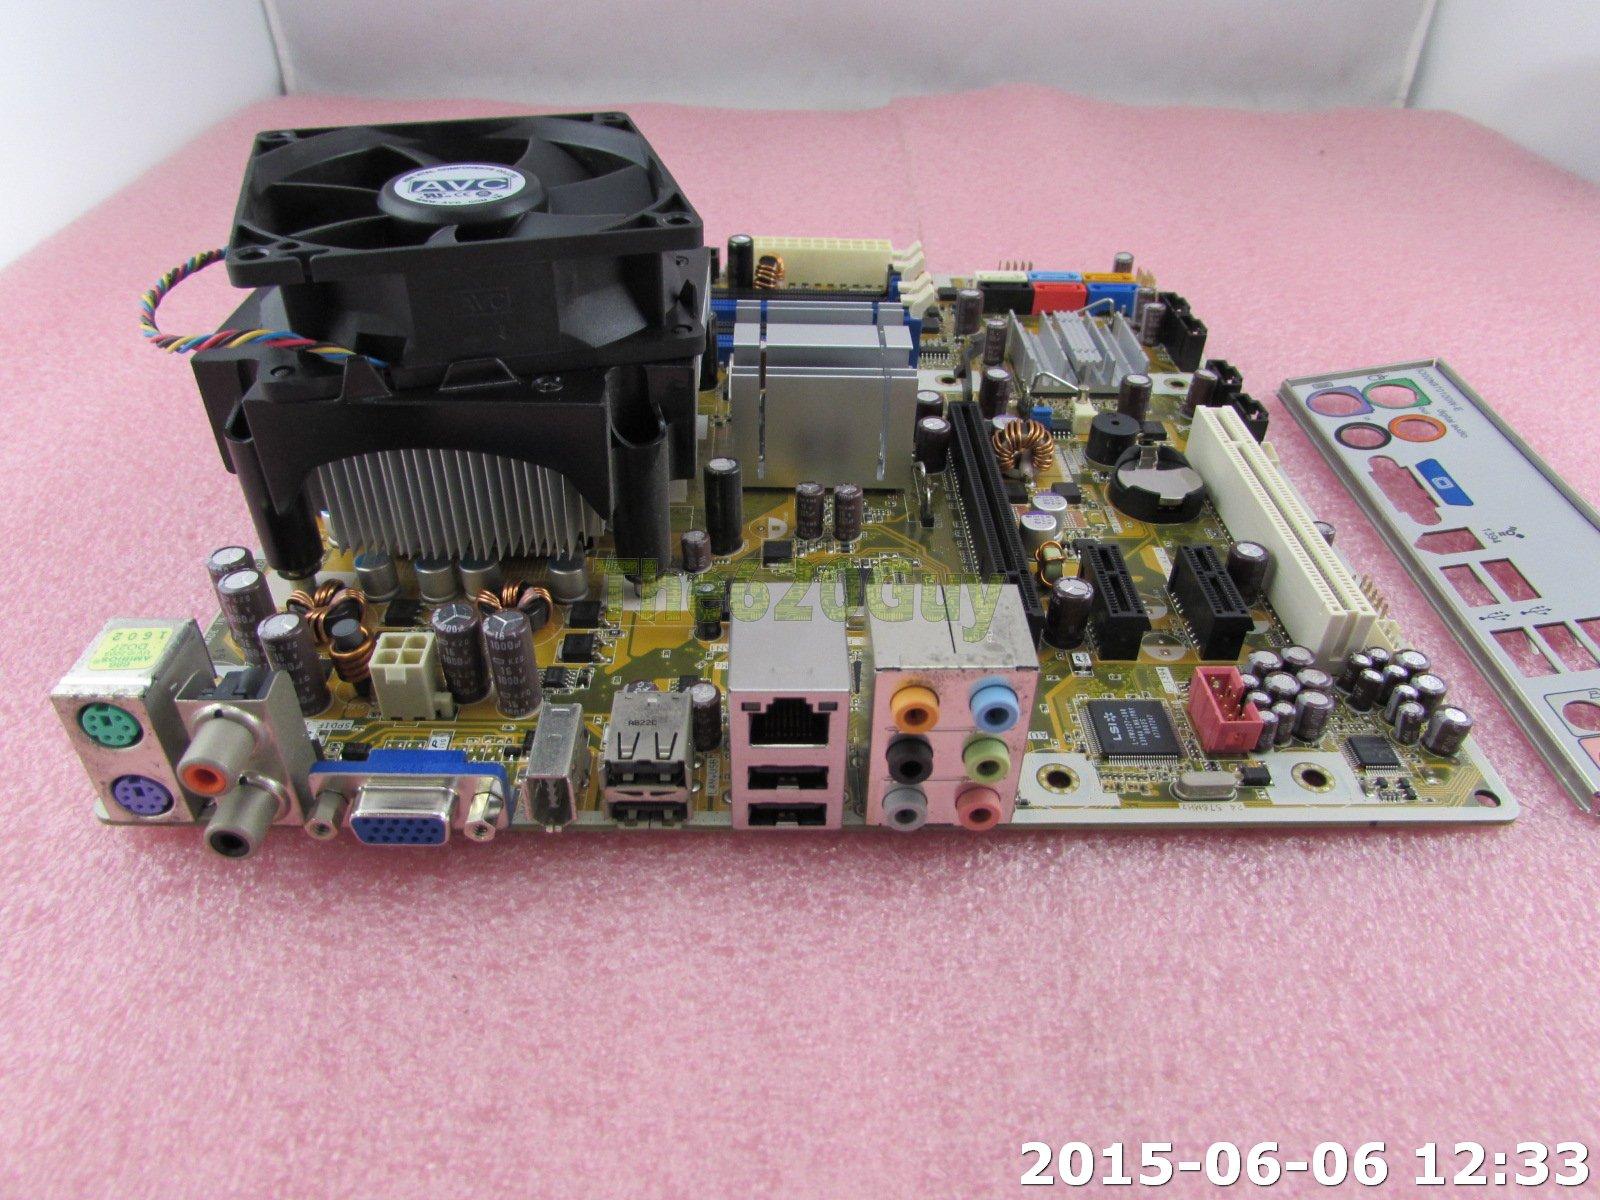 HP Benicia 492774-001 Asus IPIBL-LB Motherboard + Core 2 Quad Q6600 2.4Ghz CPU   eBay